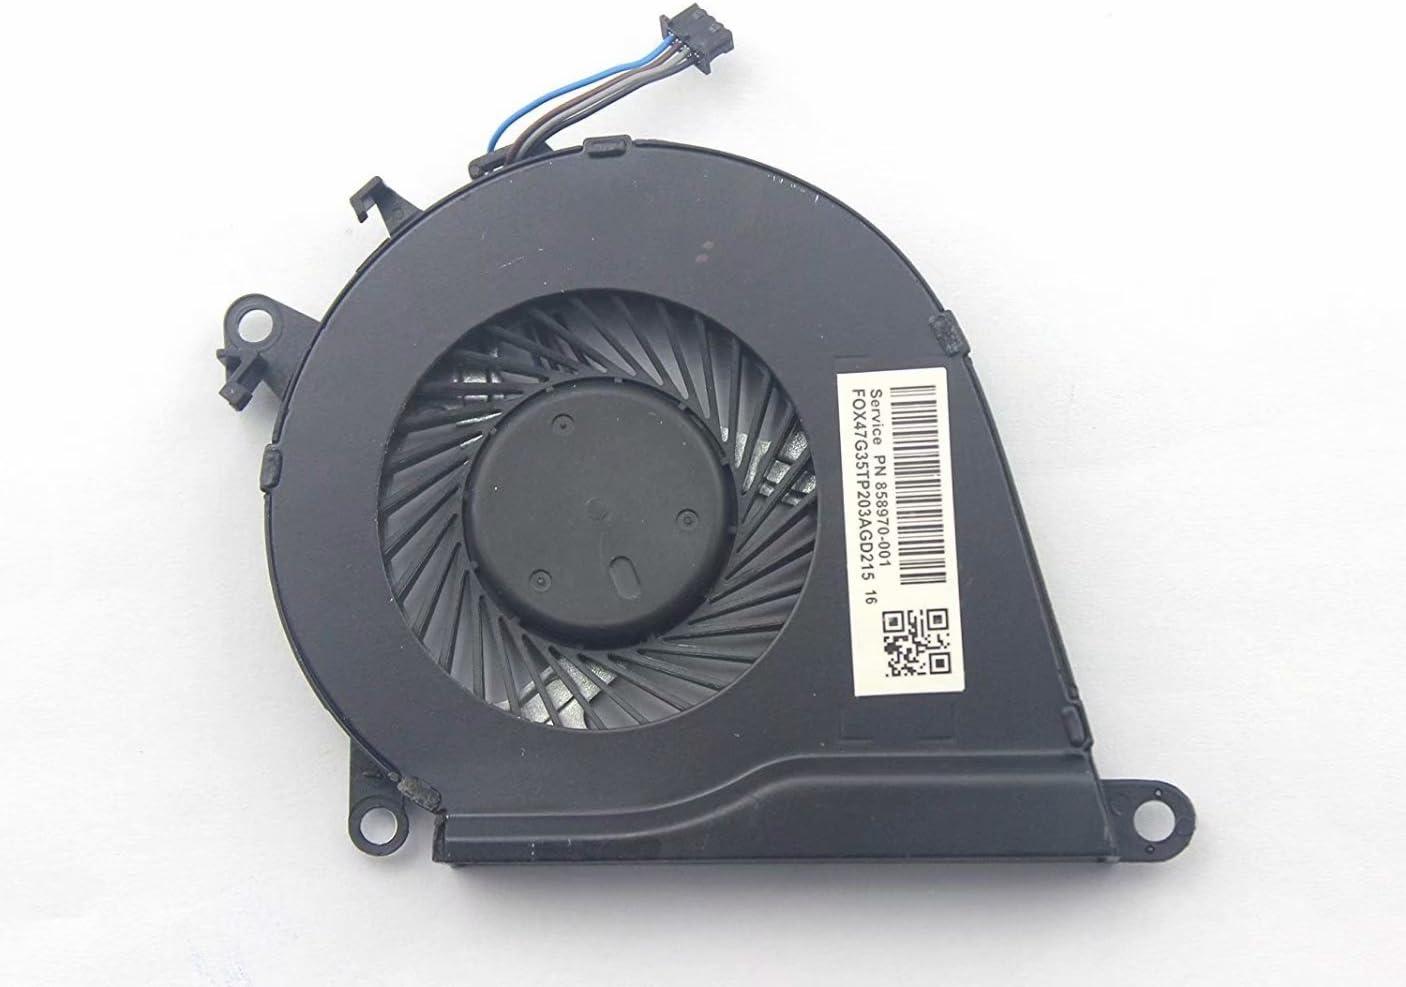 CPU Cooling Fan for HP OMEN 15-ax020ca 15-ax023dx 15-ax024tx 15-ax025tx 15-ax032tx 15-ax038tx 15-ax039nr 15-ax039tx 15-ax040tx 15-ax043dx 15-ax200nu 15-ax201la 15-ax201tx 15-ax202la 15-ax202tx